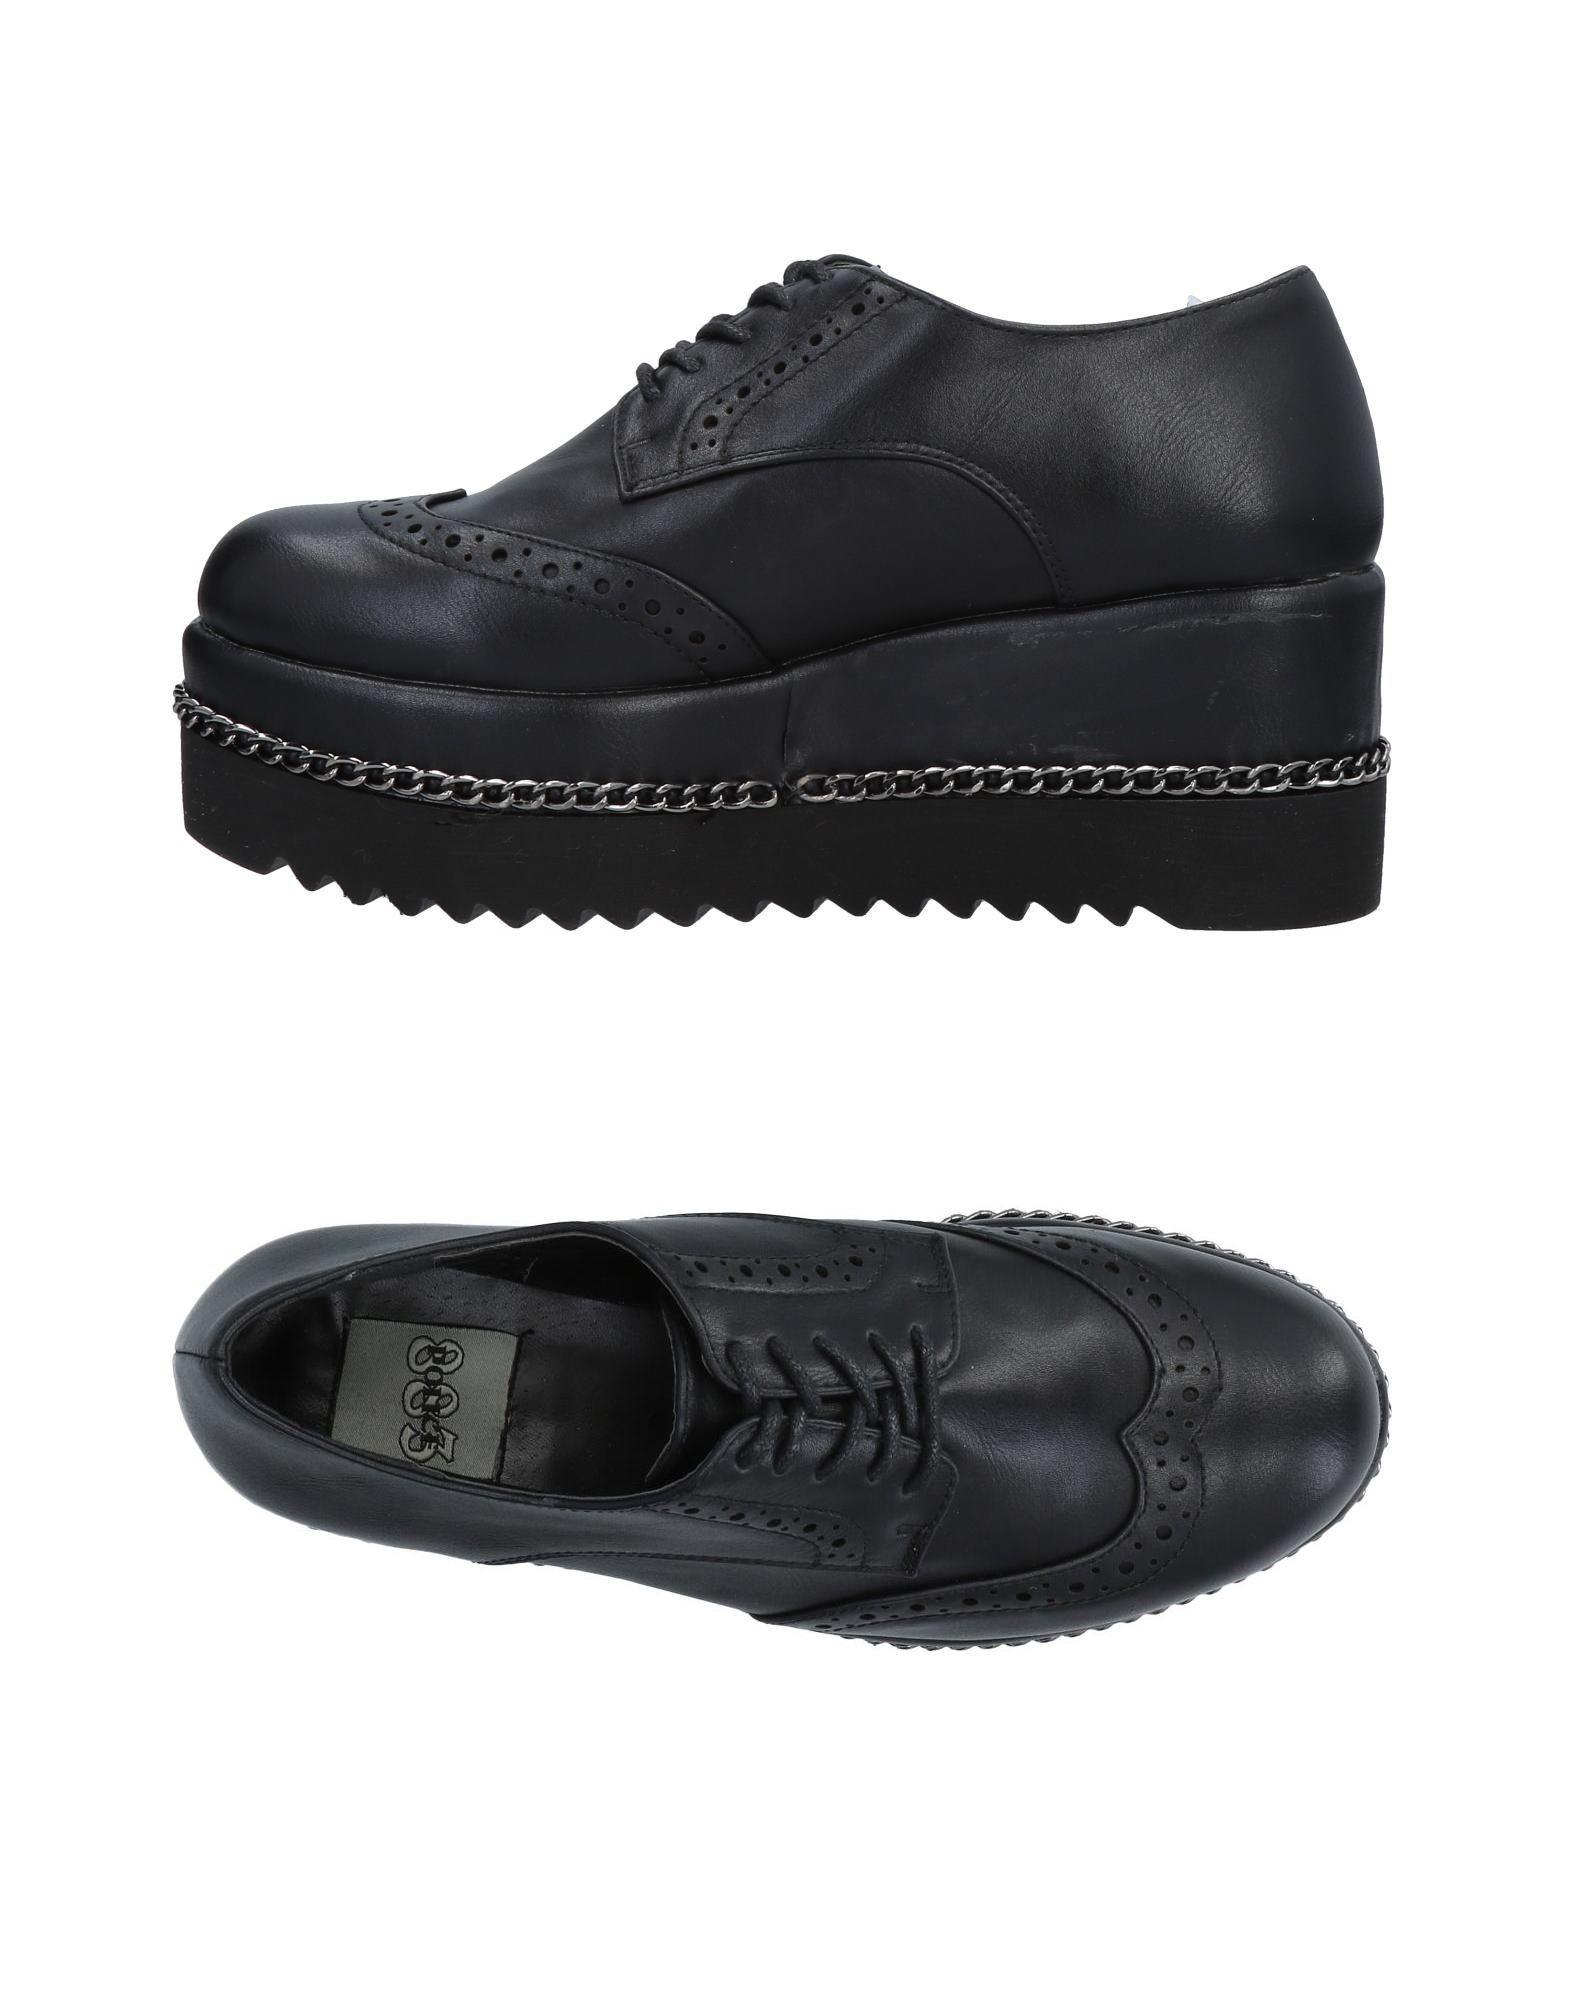 POLICE 883 Обувь на шнурках обувь на высокой платформе its own brand 116 31 32 33